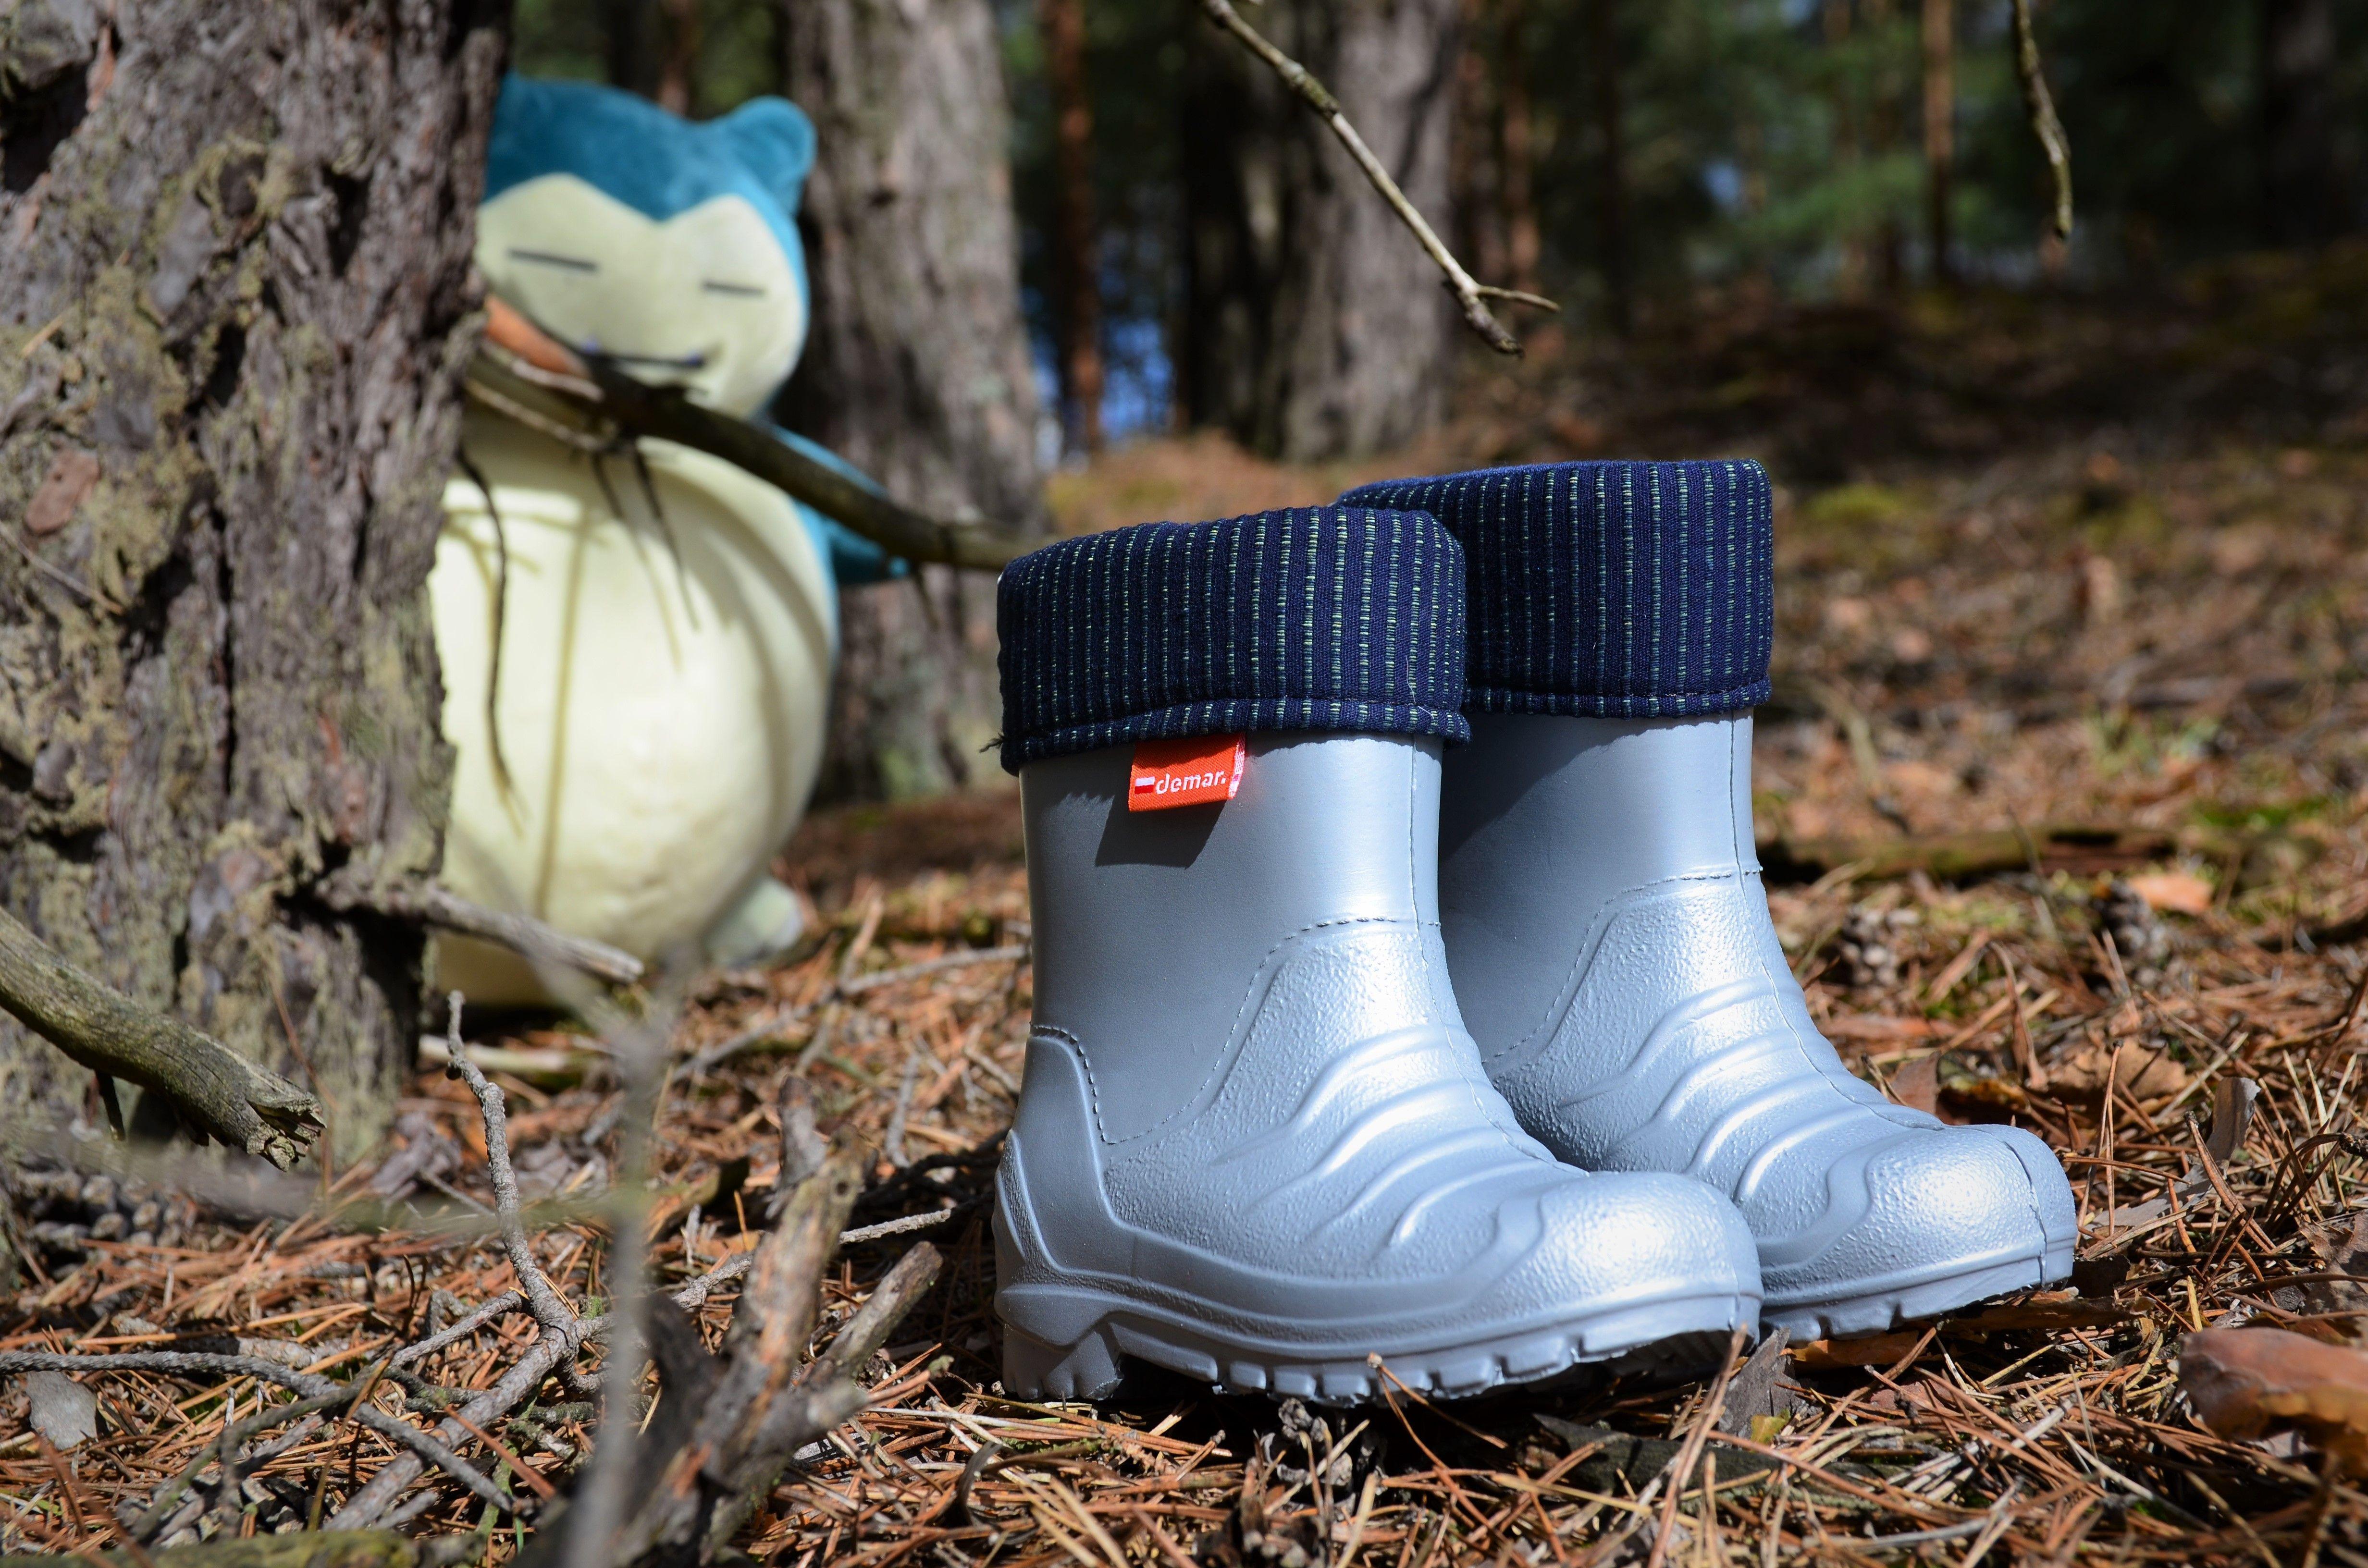 Kalosze Piankowe Dla Dzieci Szare Lekkie Pianka Demar Dino H Boots Wellington Boot Rain Boots